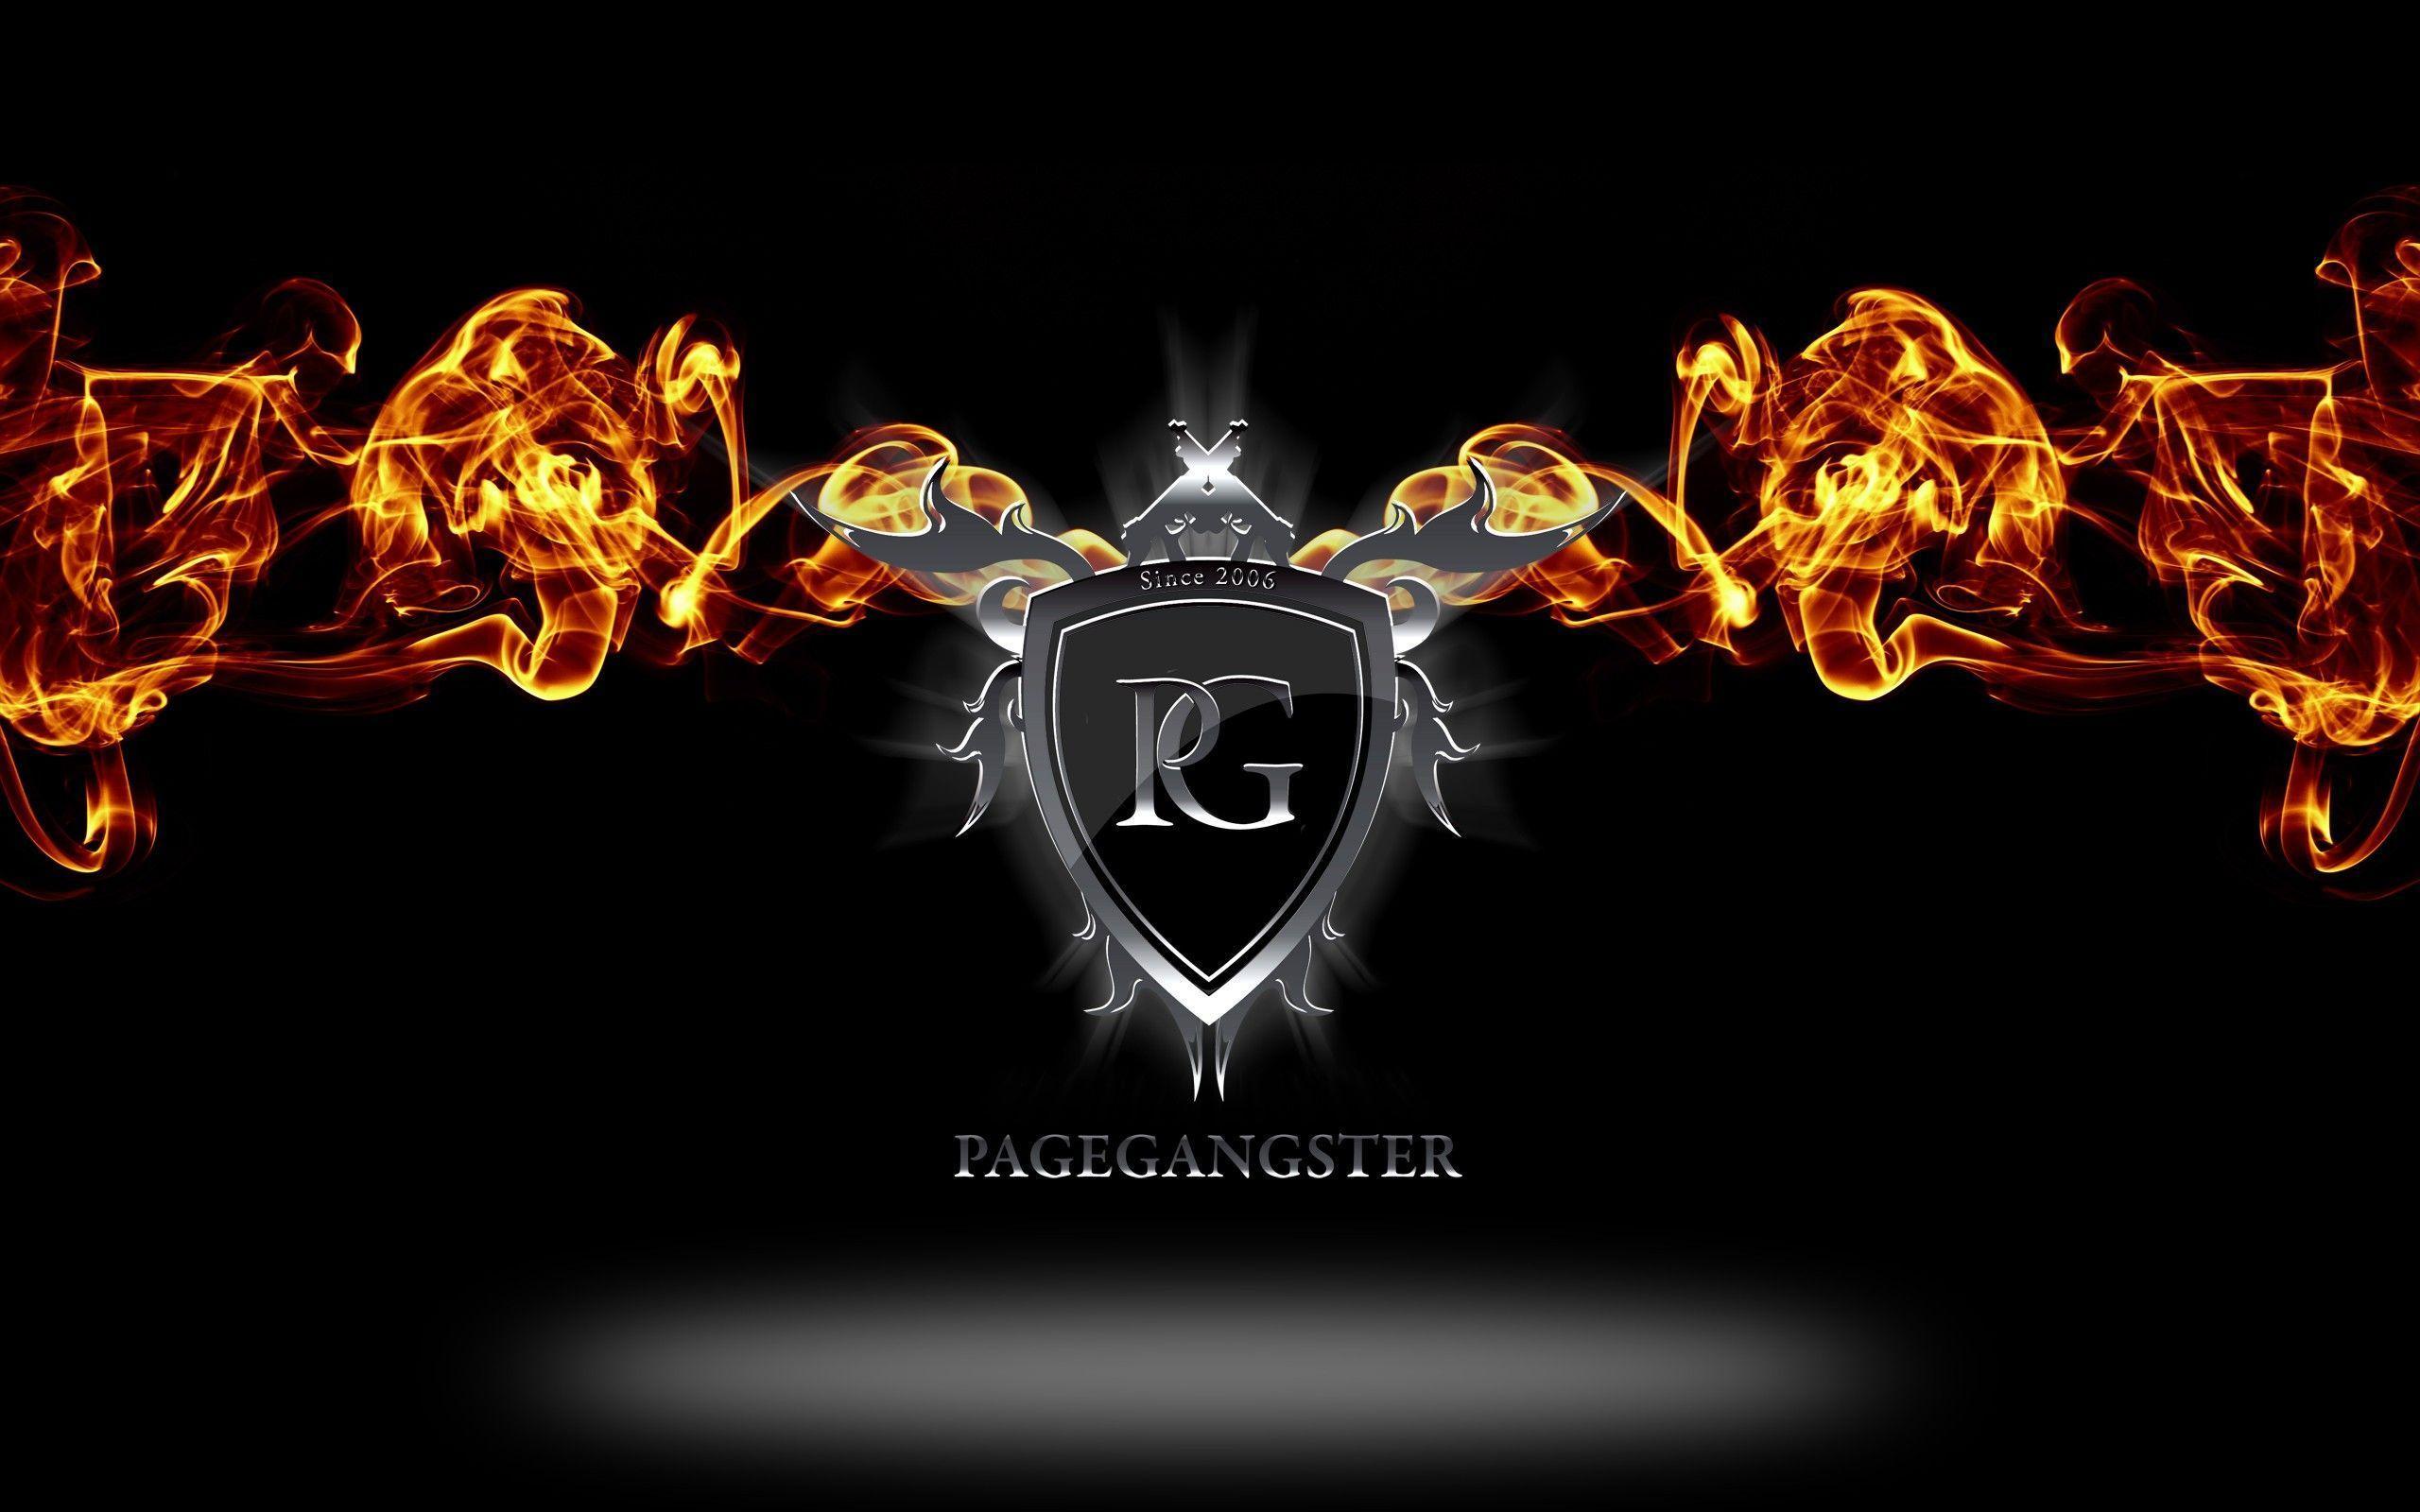 Download Wallpaper Logo Gangster - wp2628455  Trends_662391.jpg